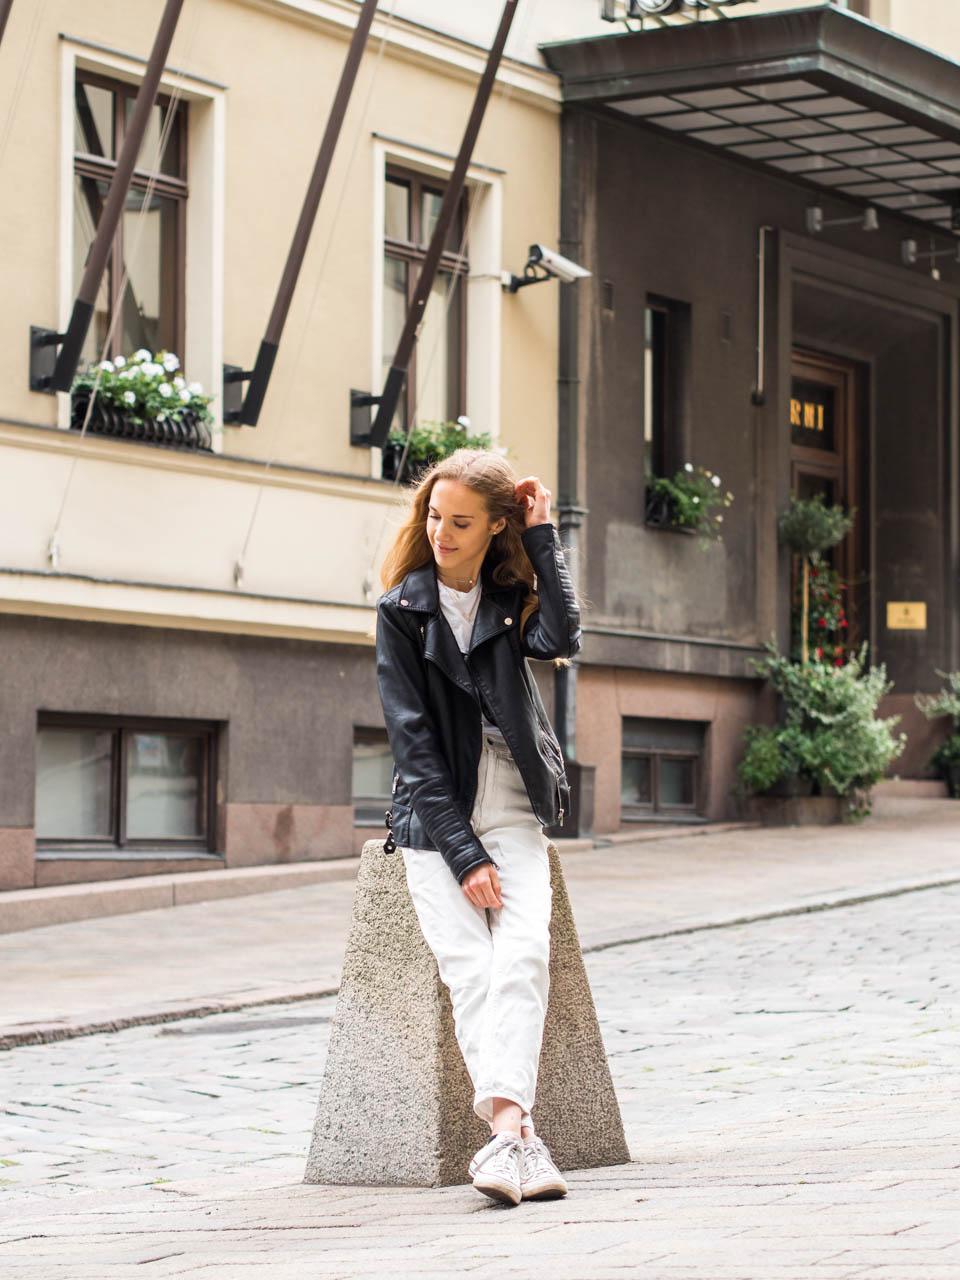 fashion-blogger-autumn-outfit-inspiration-shopping-helsinki-muoti-blogi-syysmuoti